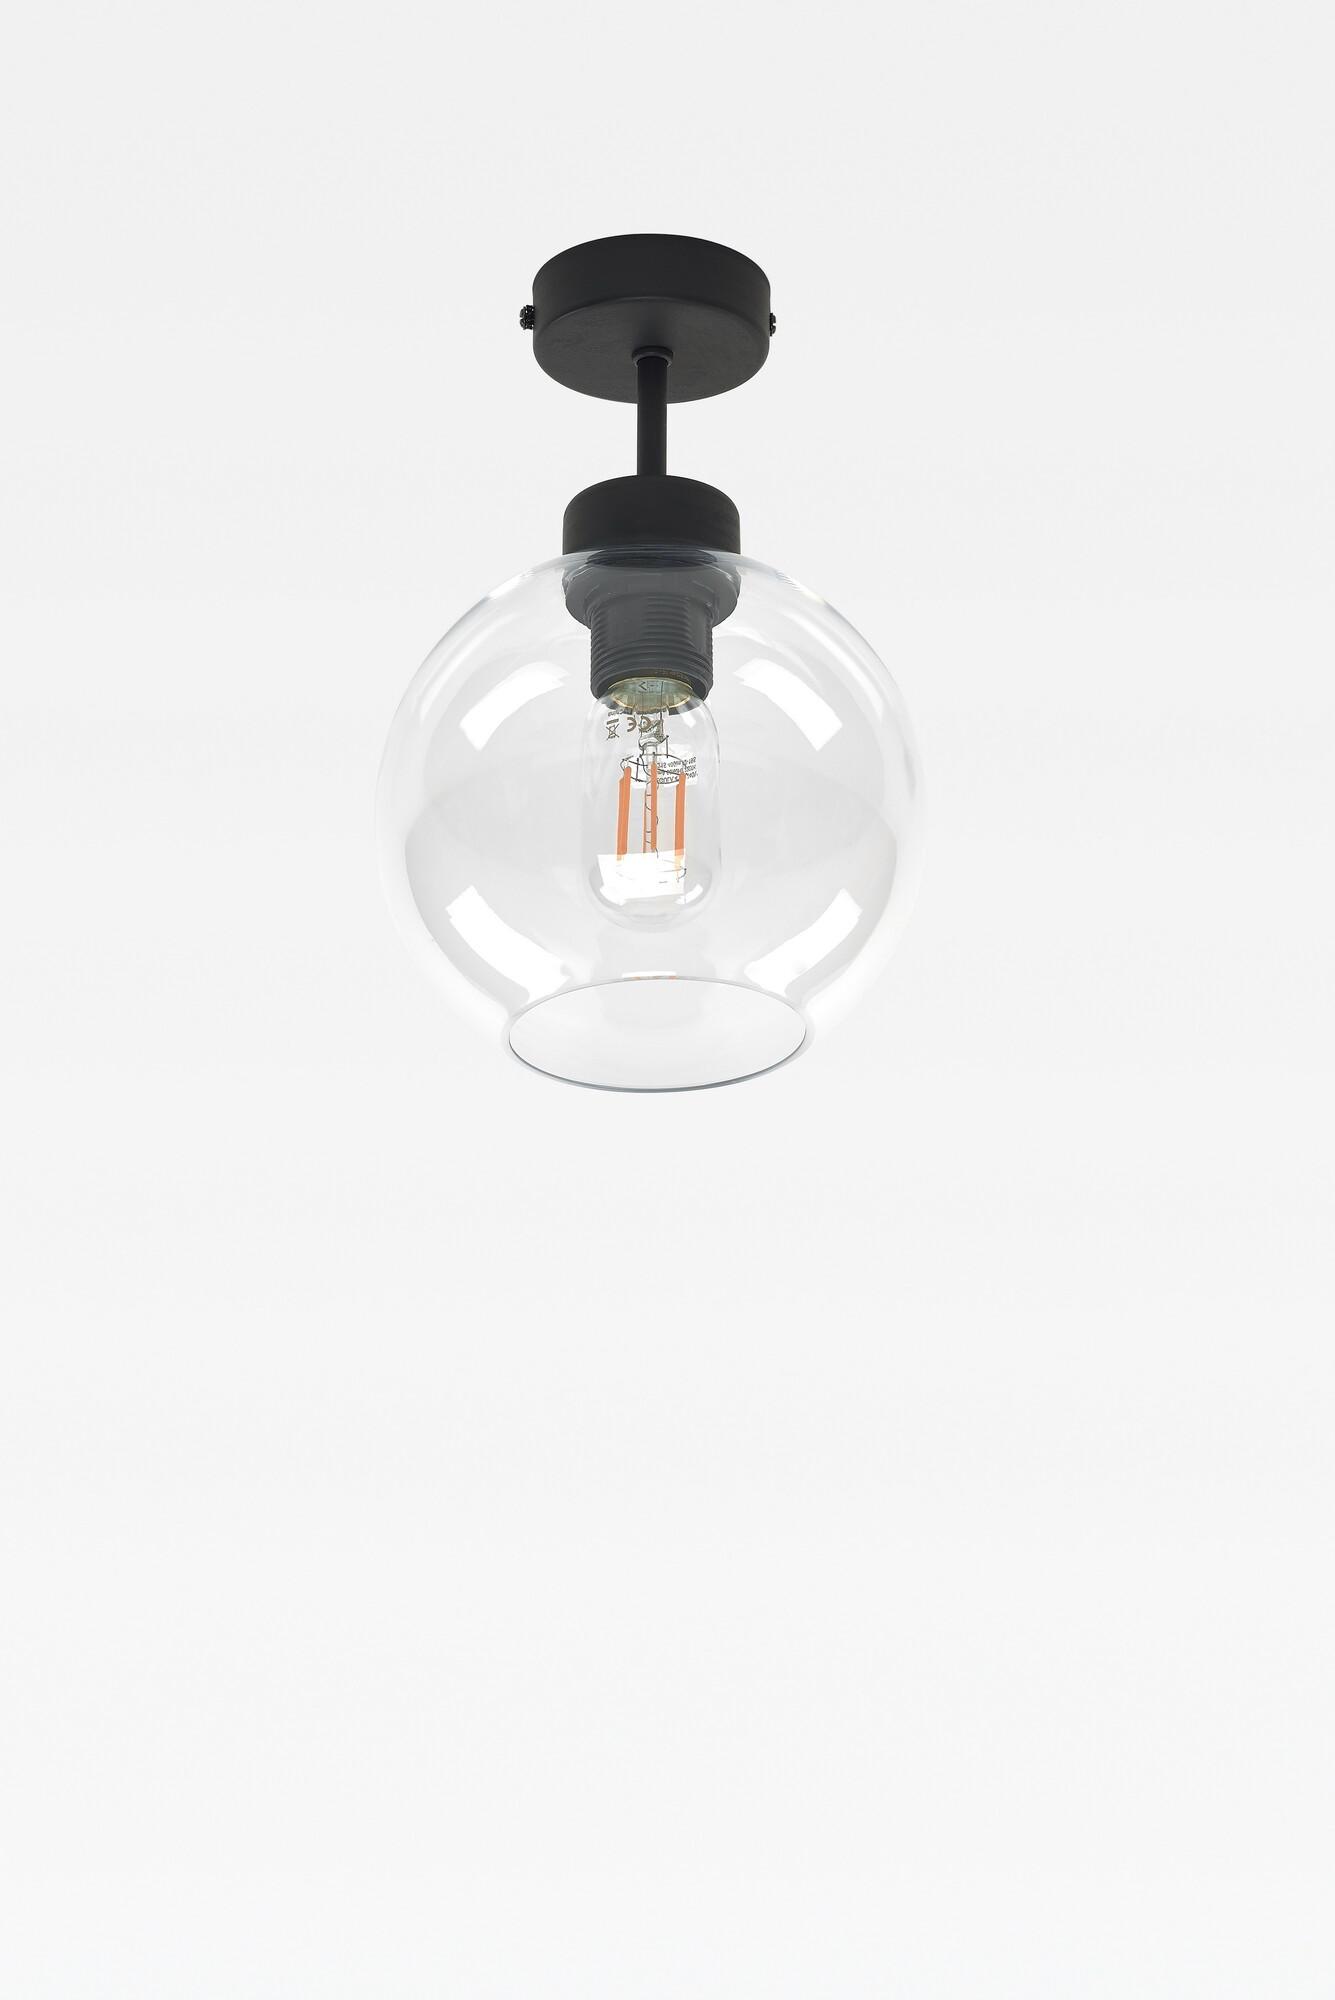 BAGEL2 Plafondlamp E27 1x Bruin